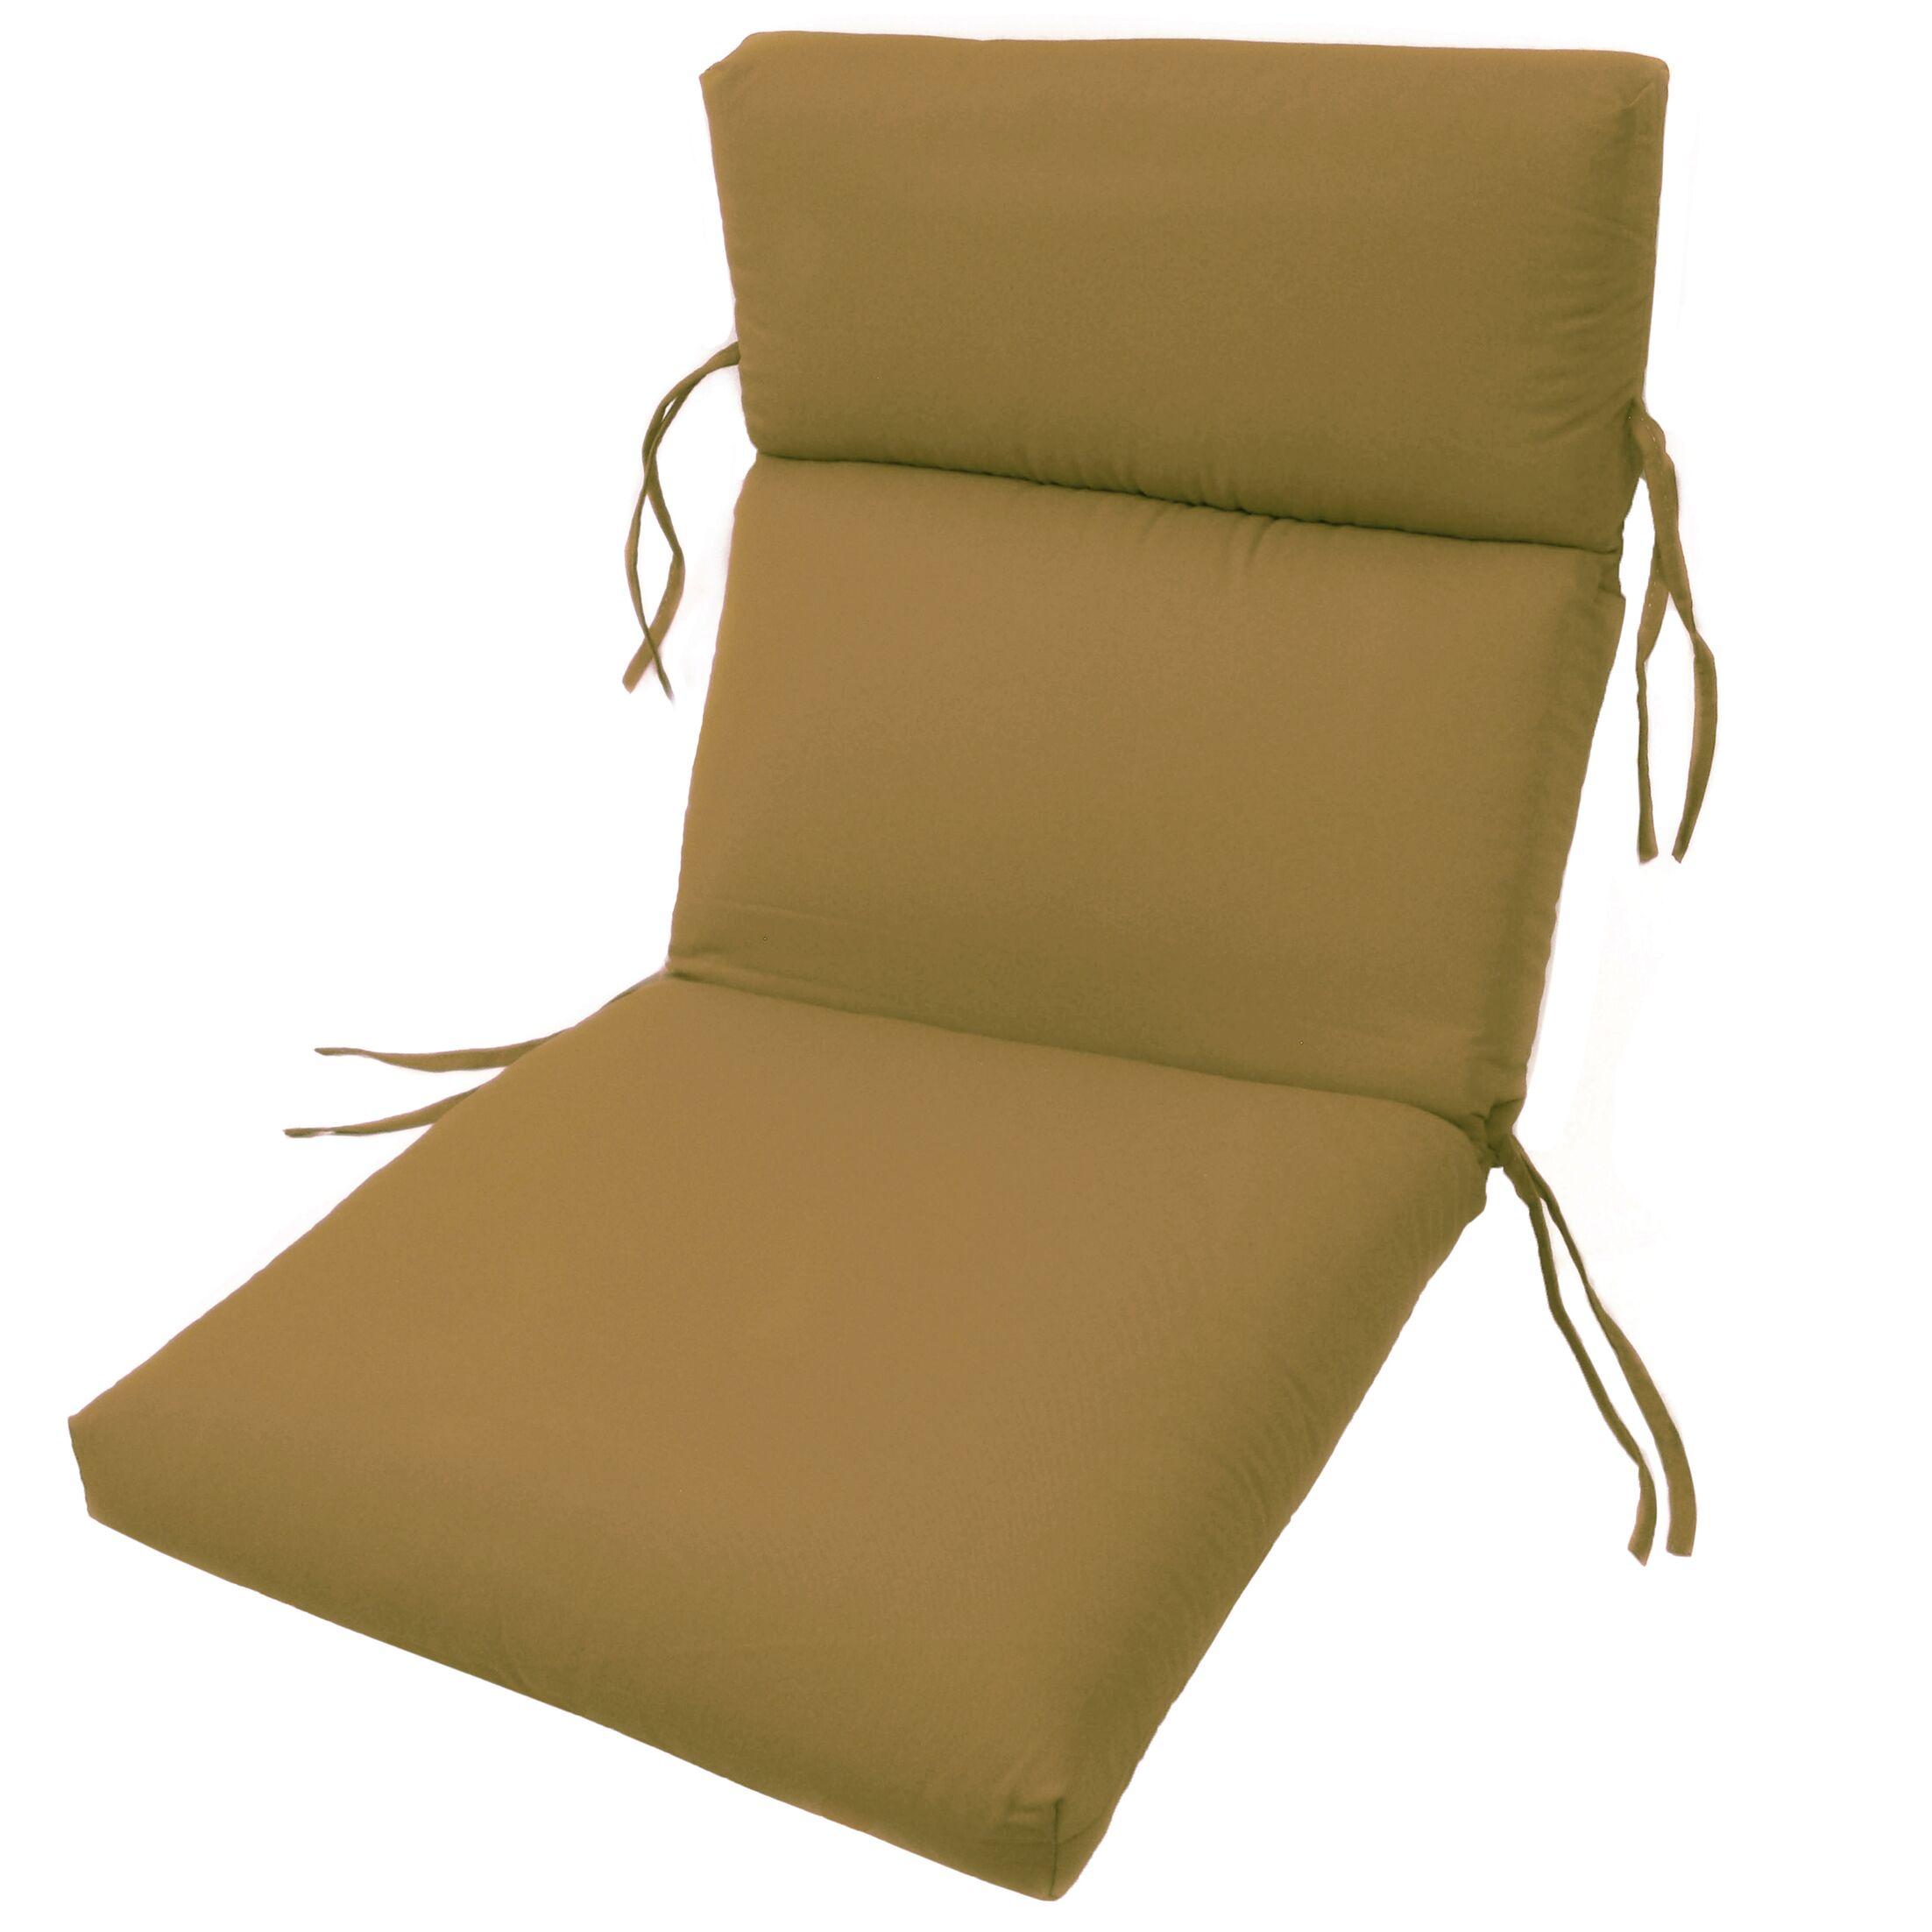 Channeled Indoor/Outdoor Sunbrella Lounge Cushion Fabric: Brass